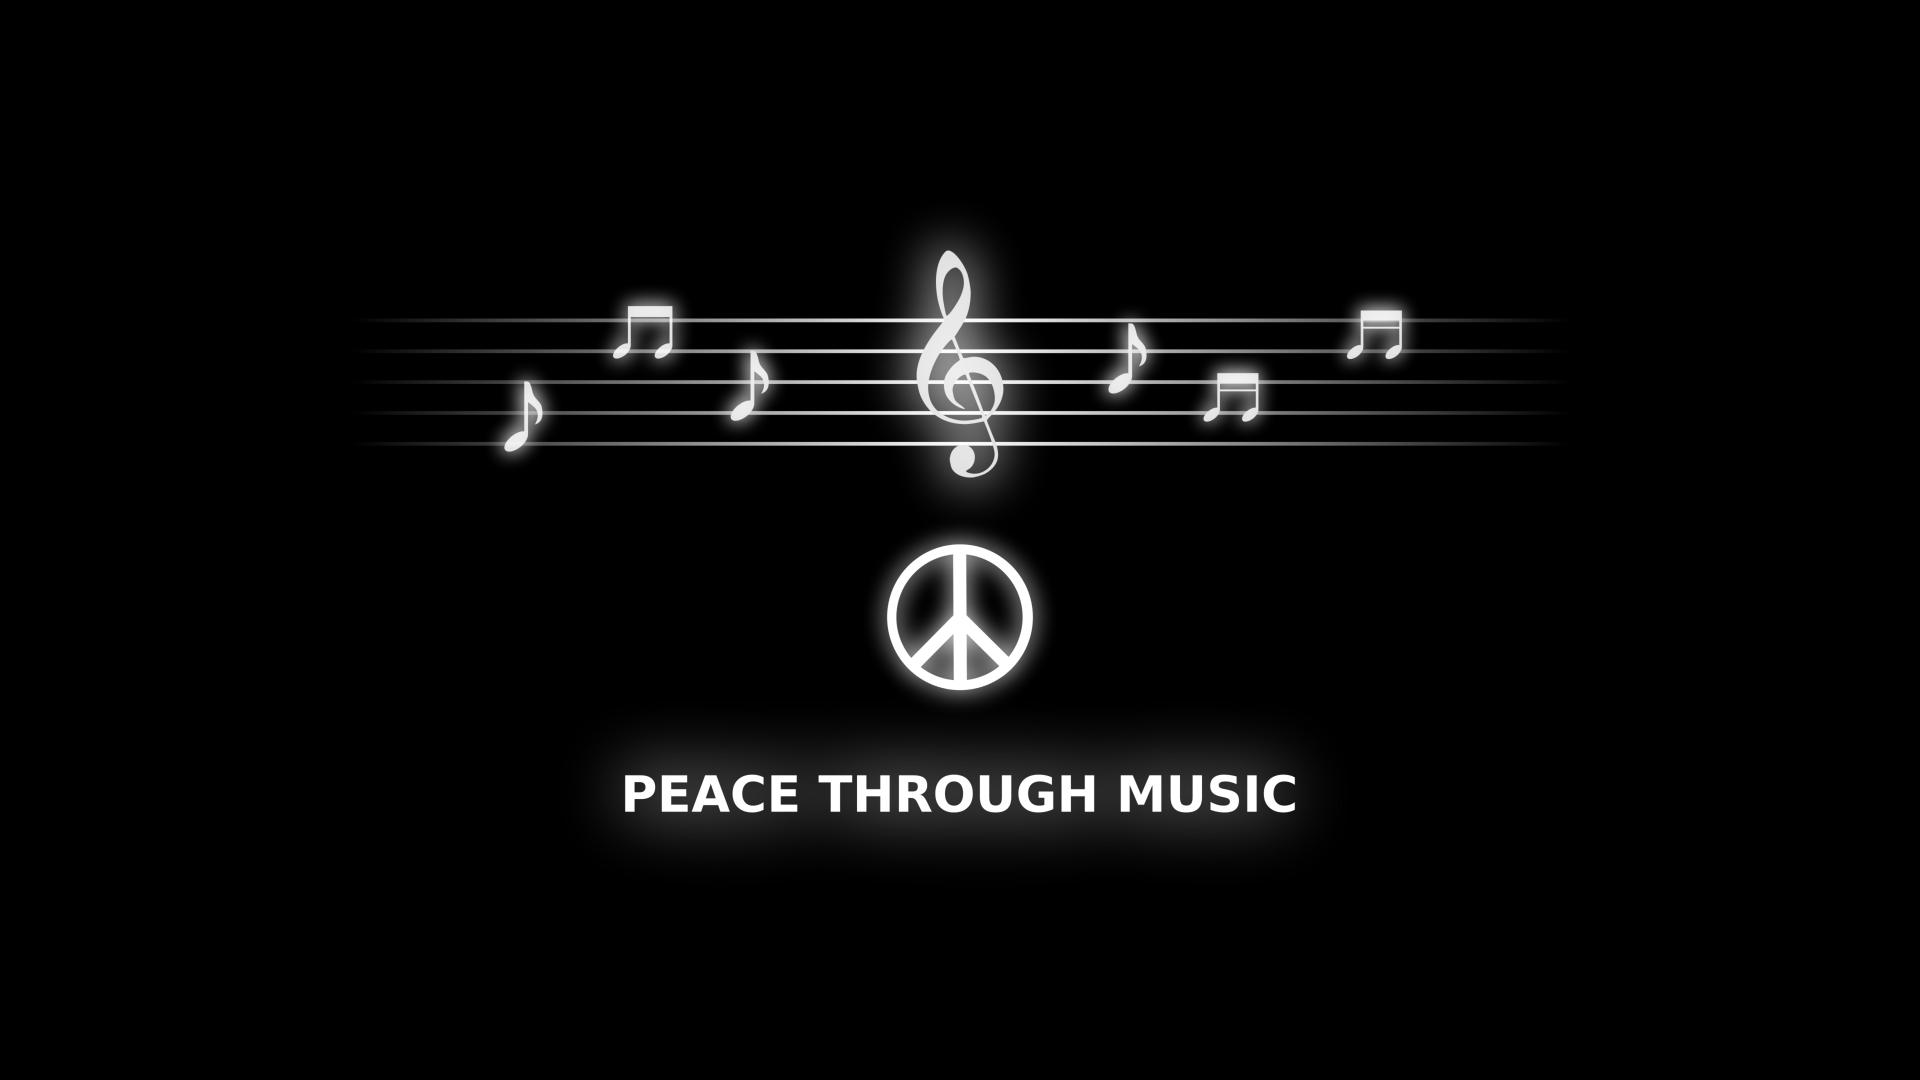 music peace: